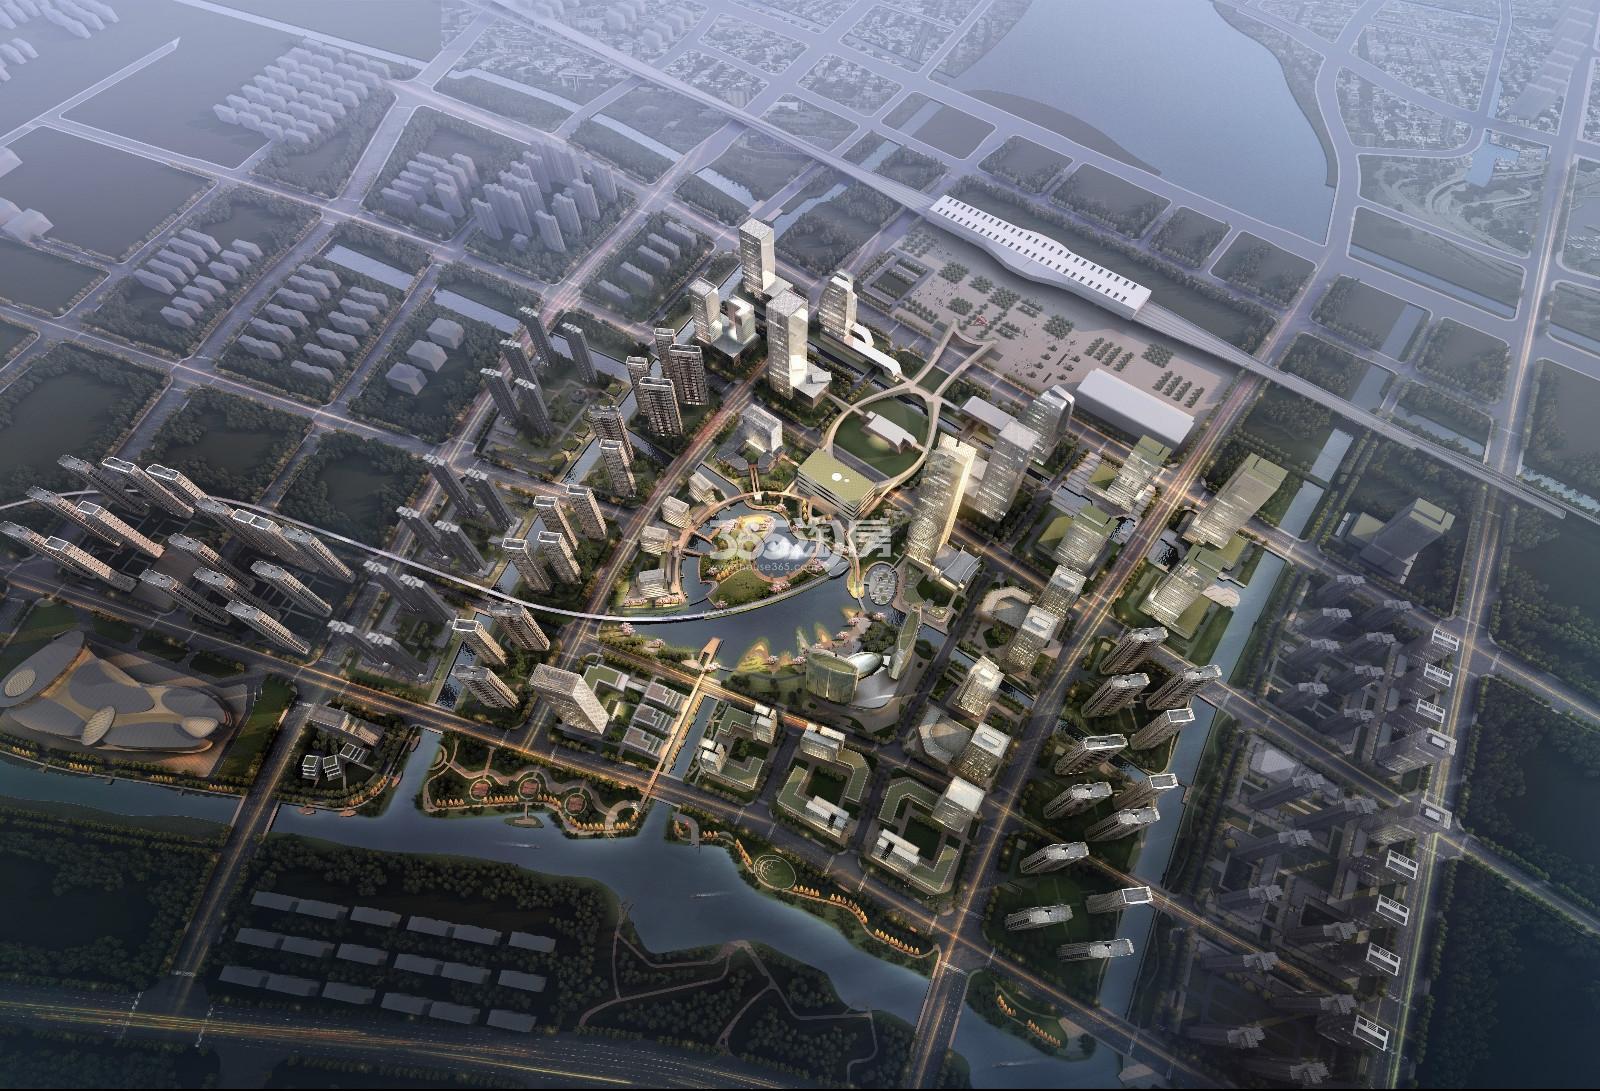 MOC芯城汇鸟瞰图